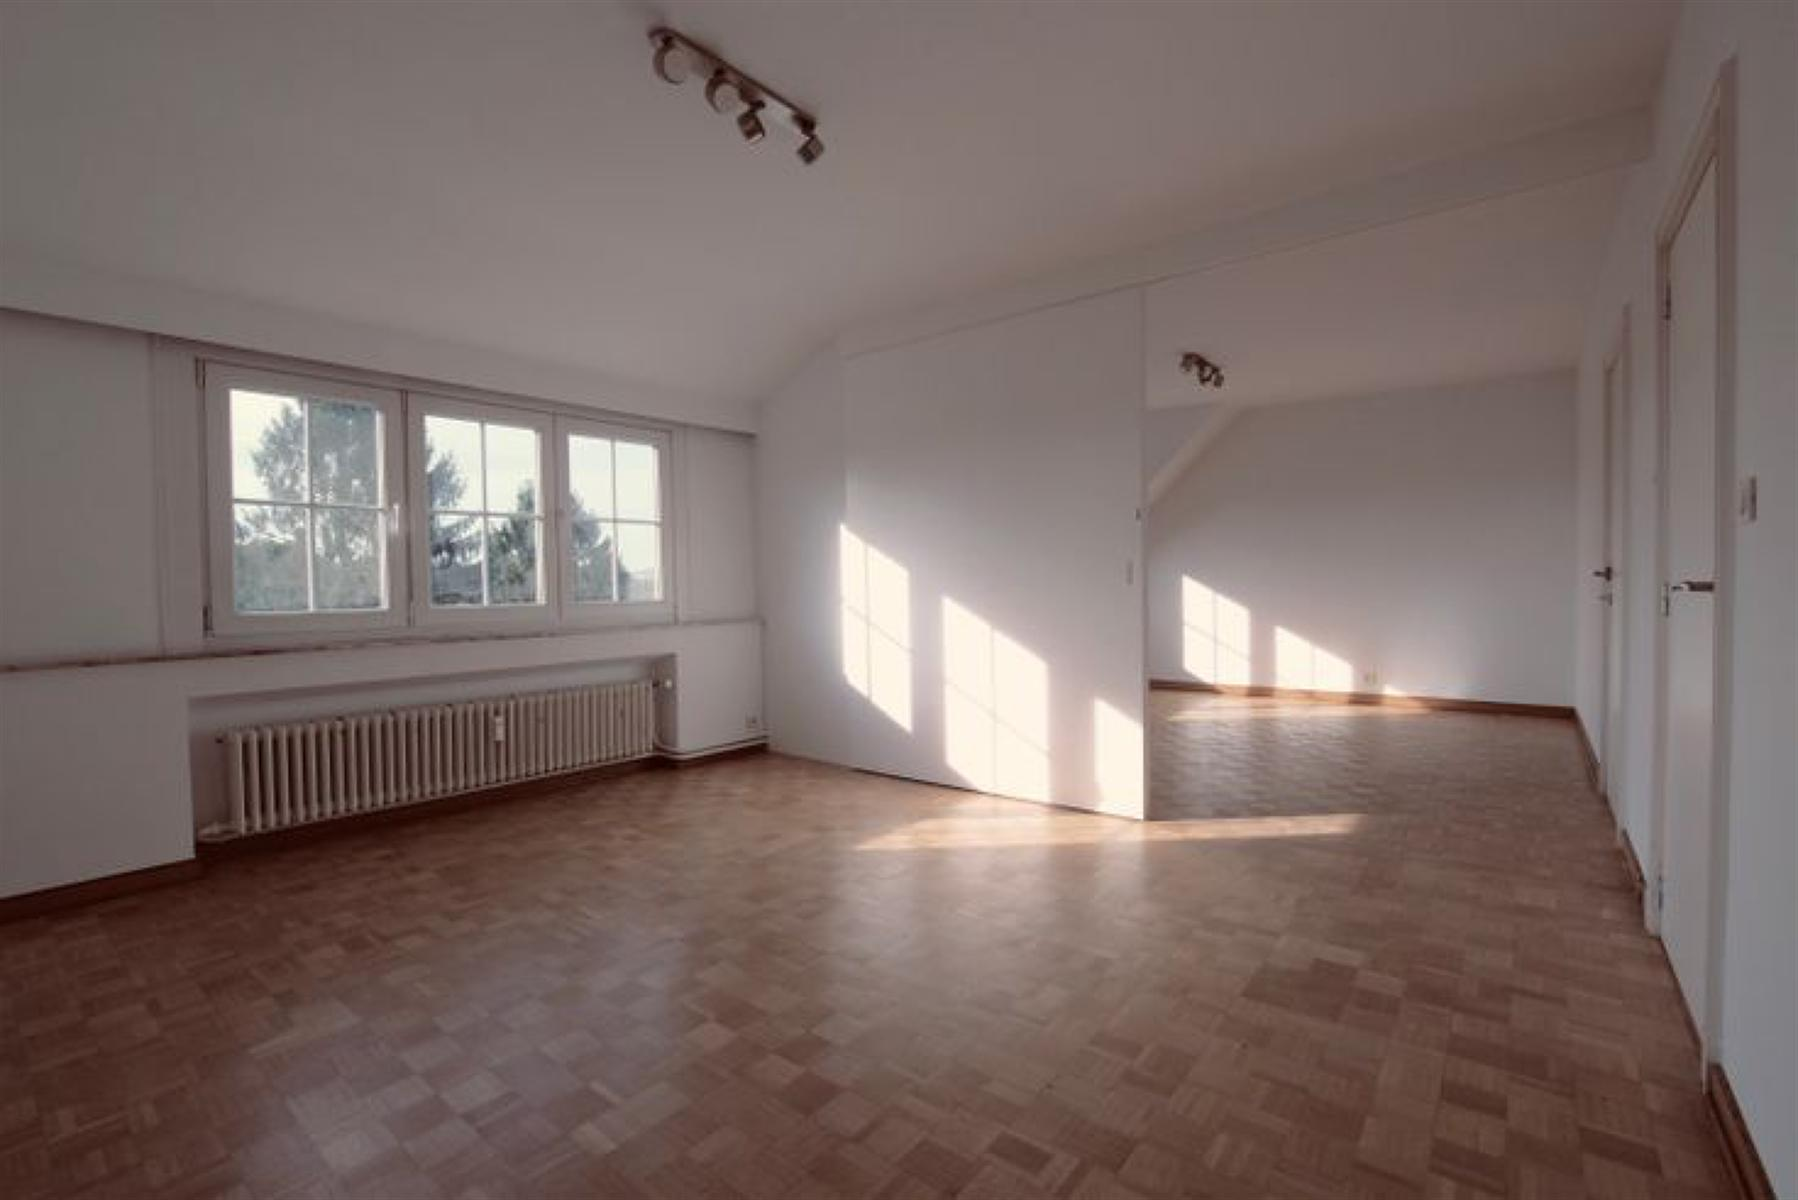 Flat - Auderghem - #4520709-1